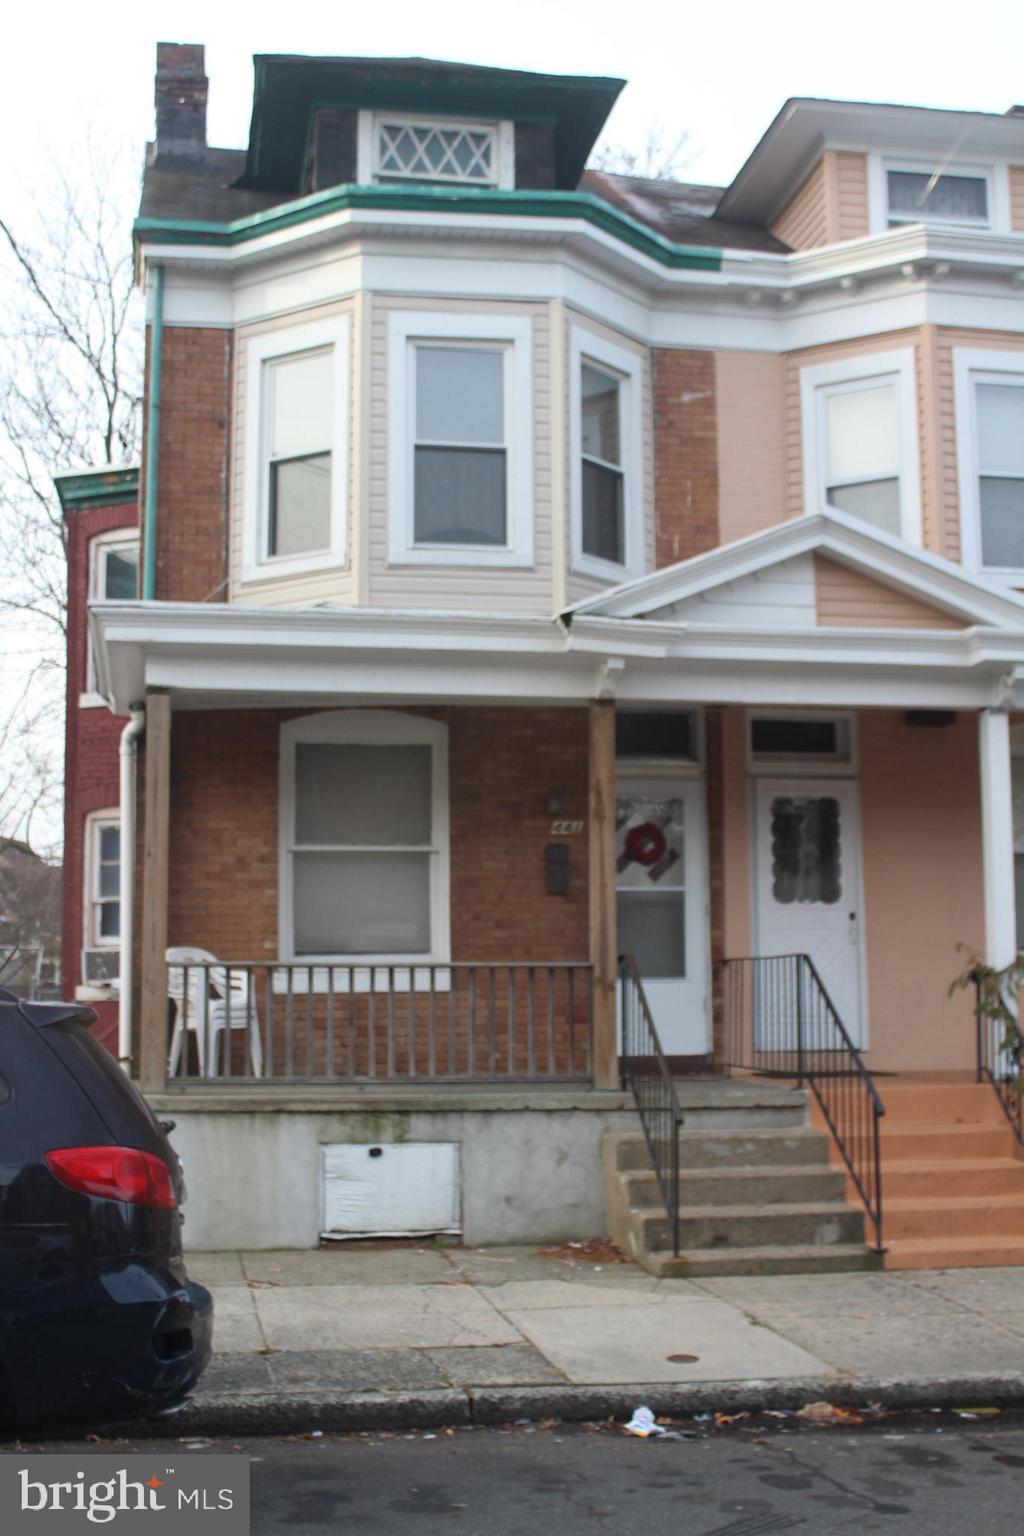 441 W HANOVER ST, TRENTON, NJ 08608